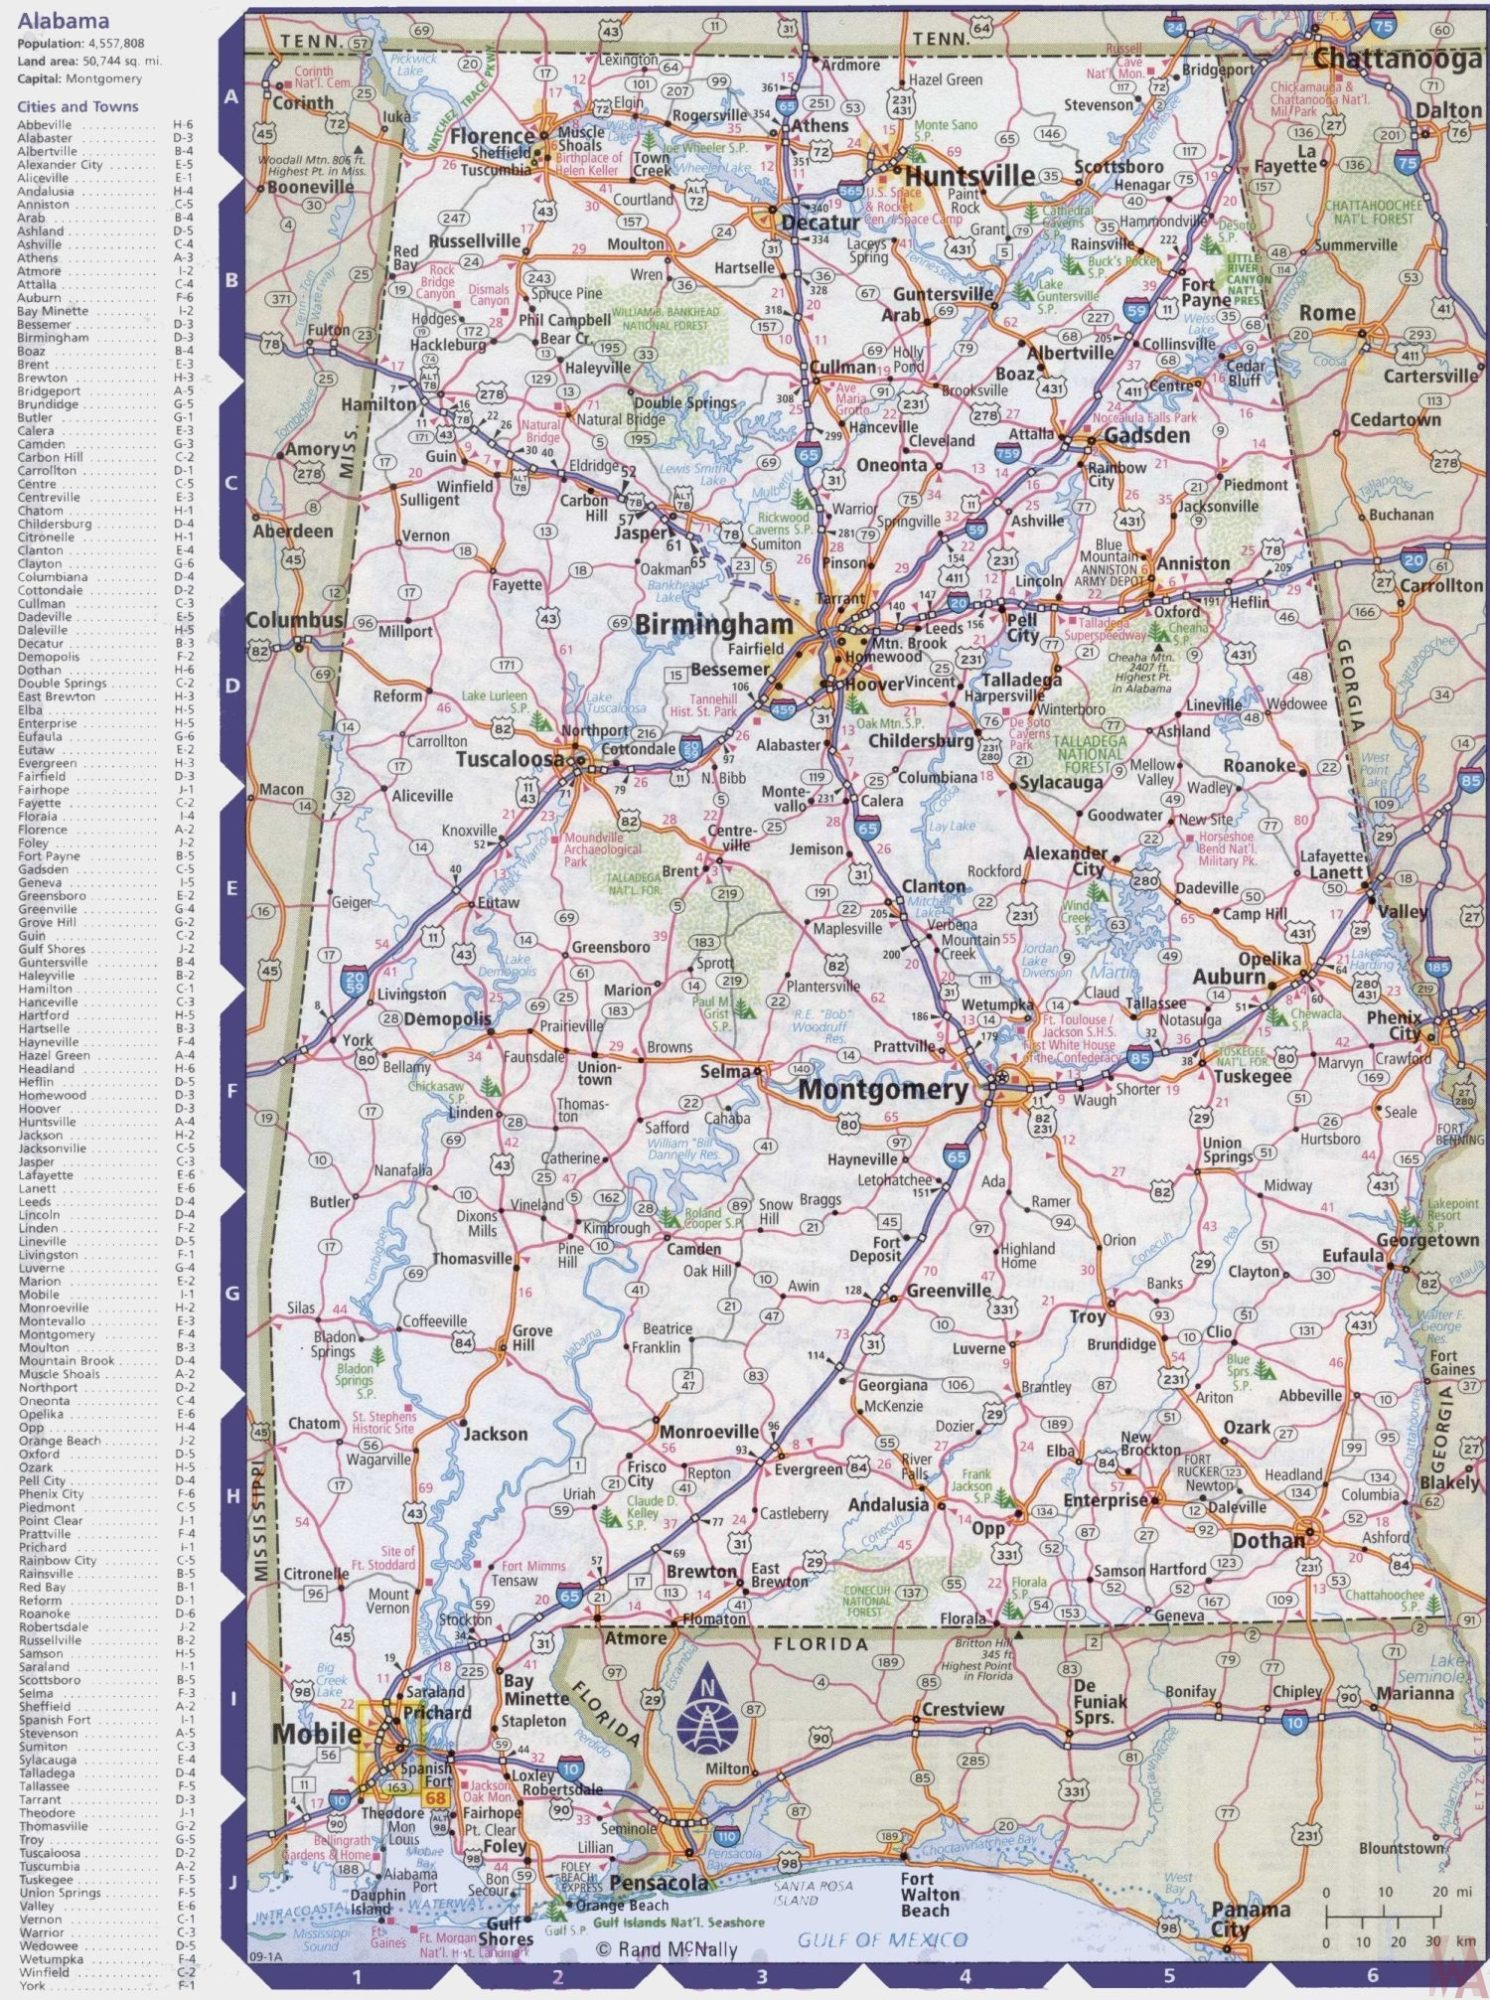 Alabama Large Political  Map |  Political  Map of Alabama With Capital , city and River lake